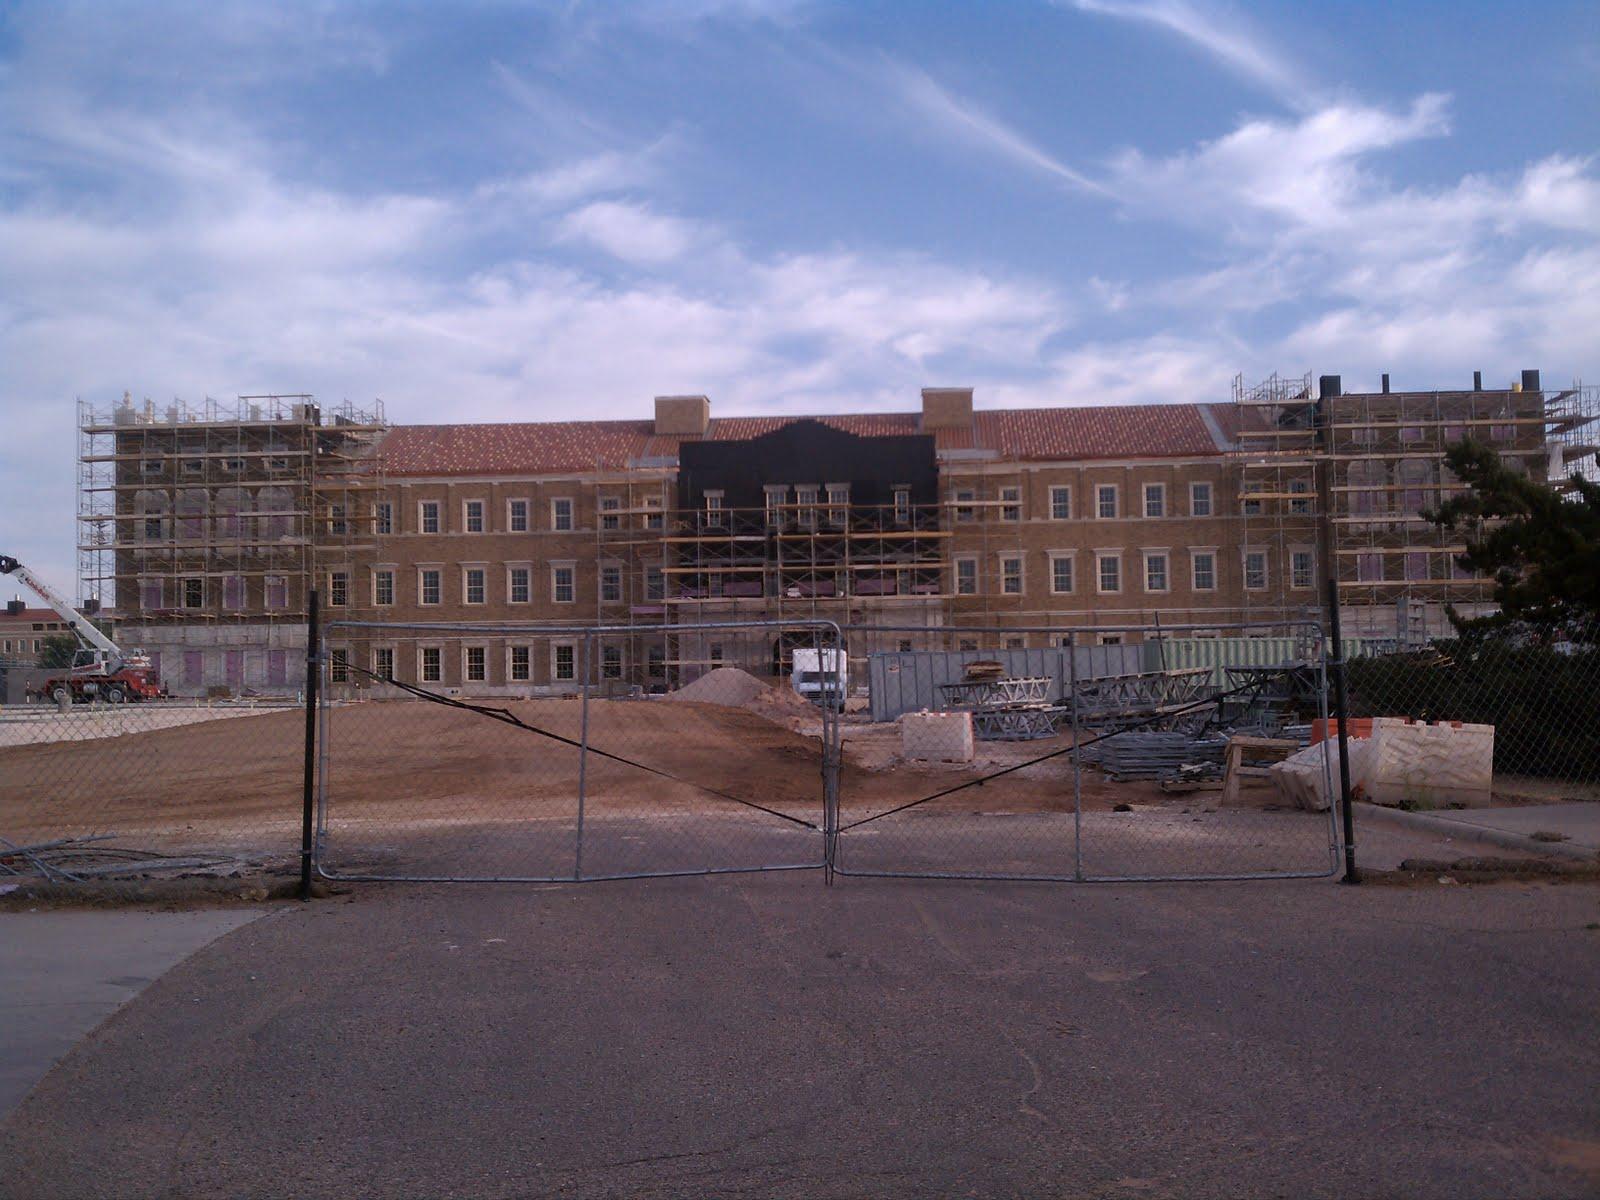 http://3.bp.blogspot.com/-3dDpoXXHuRc/TeT6NTz_qfI/AAAAAAAAAXE/pAJgrc2SGDM/s1600/rawls+business+administration+building.jpg